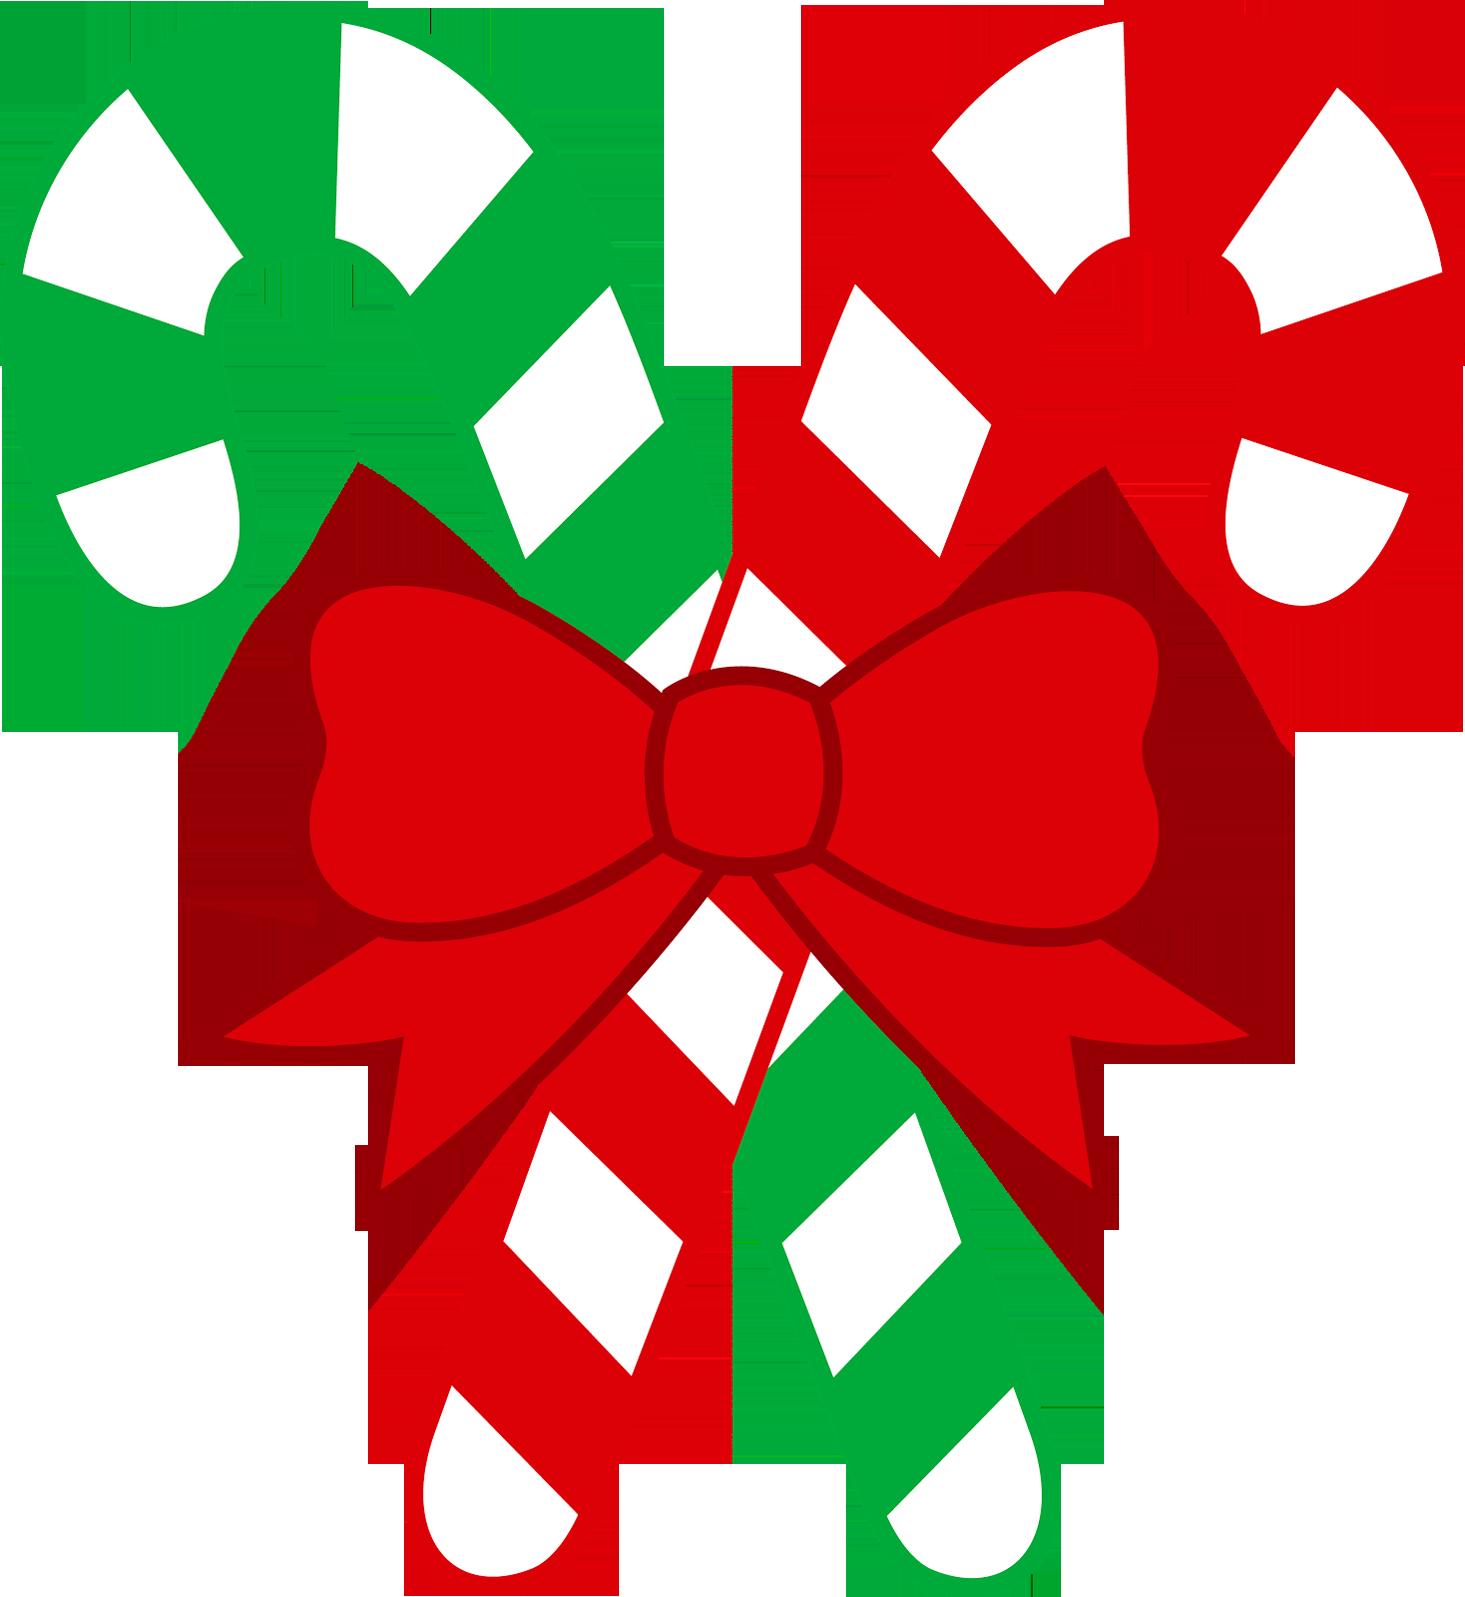 Free candy cane clipart public domain christmas clip art images 2